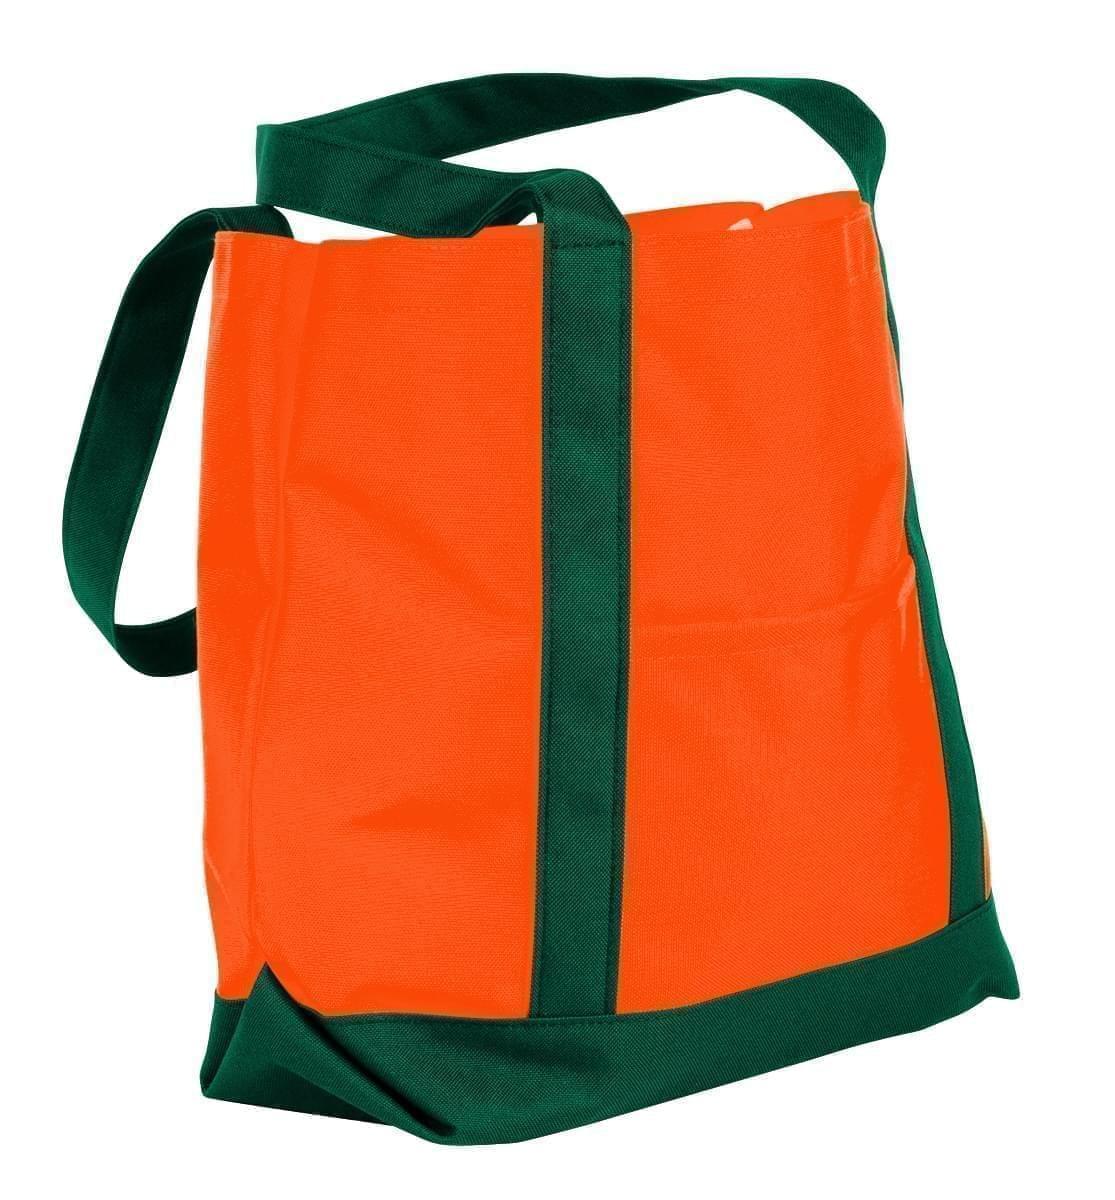 USA Made Nylon Poly Boat Tote Bags, Orange-Hunter Green, XAACL1UAXV